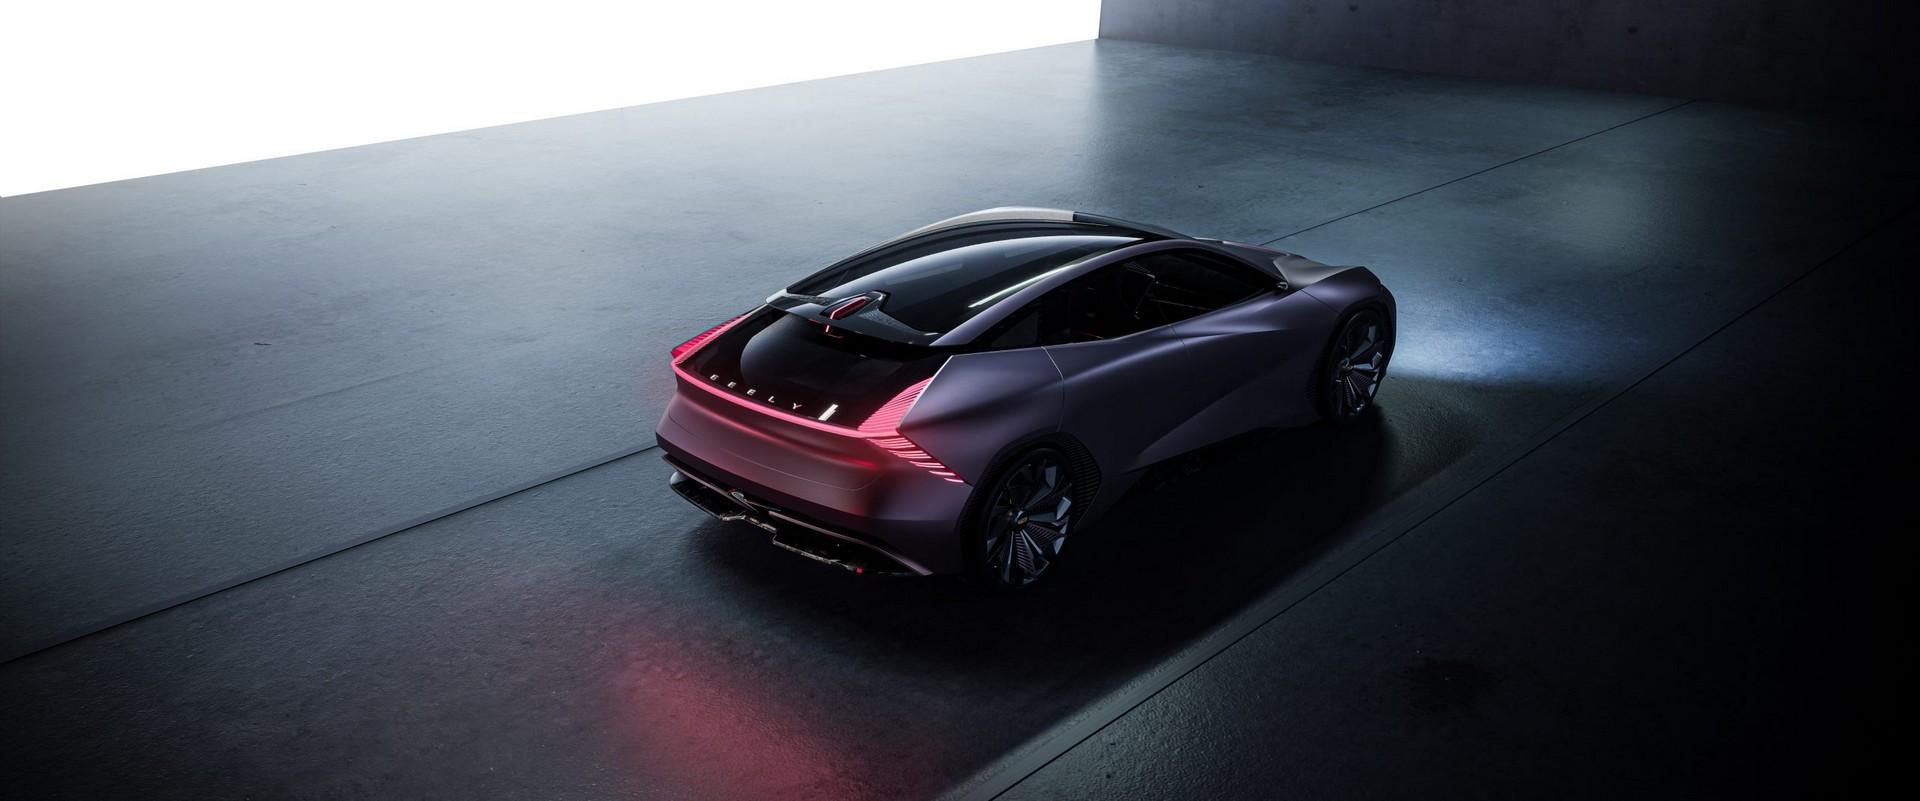 Geely-Vision-Starburst-concept-14